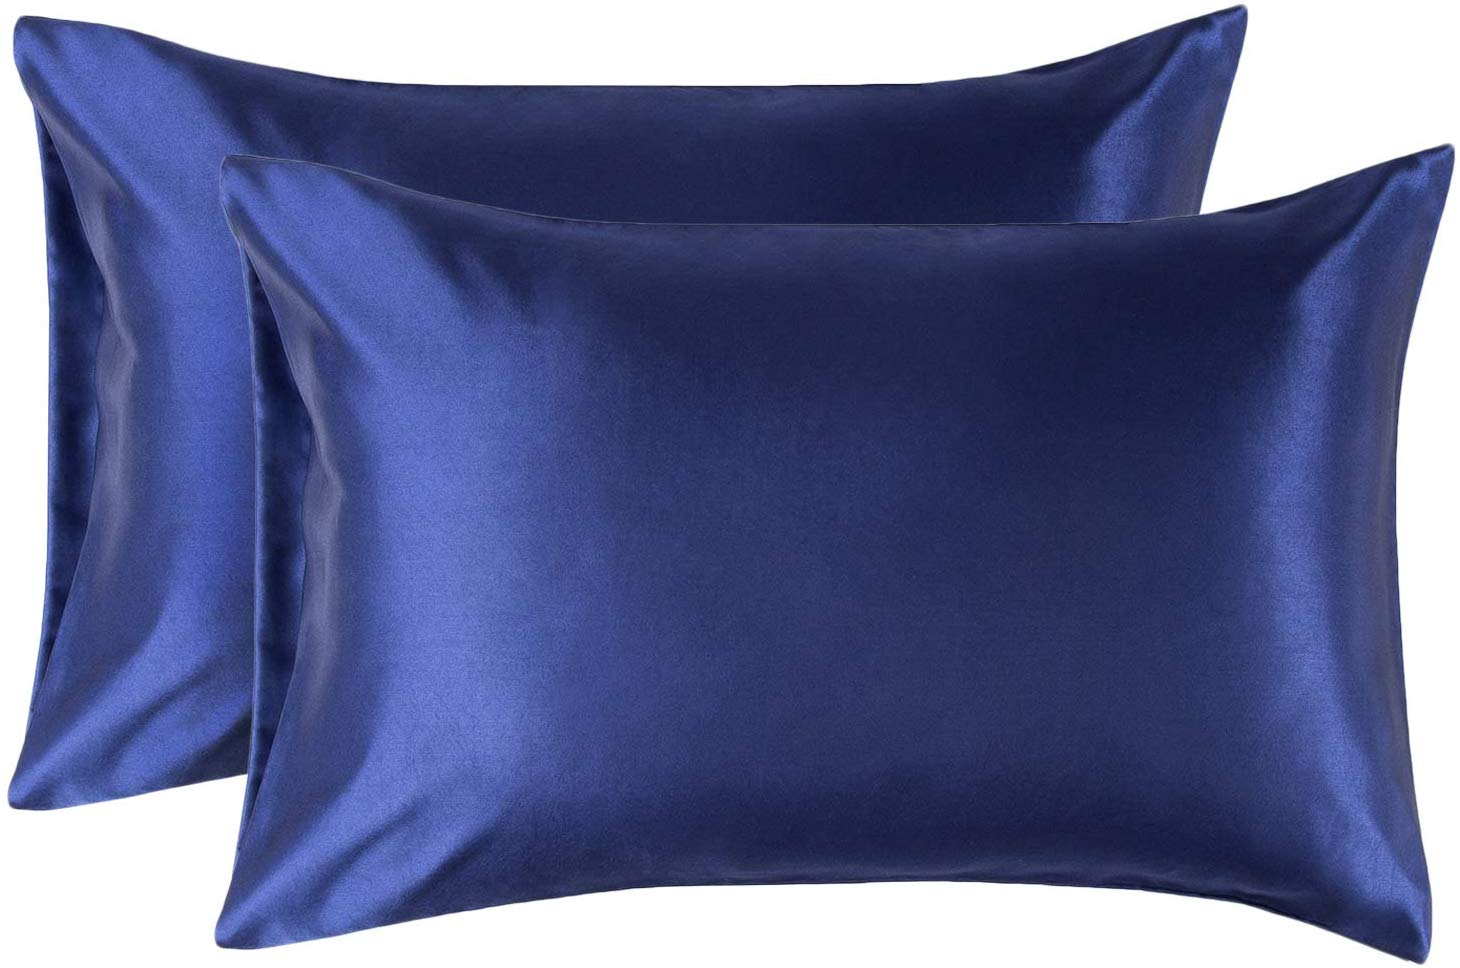 Satin pillowcase   Etsy